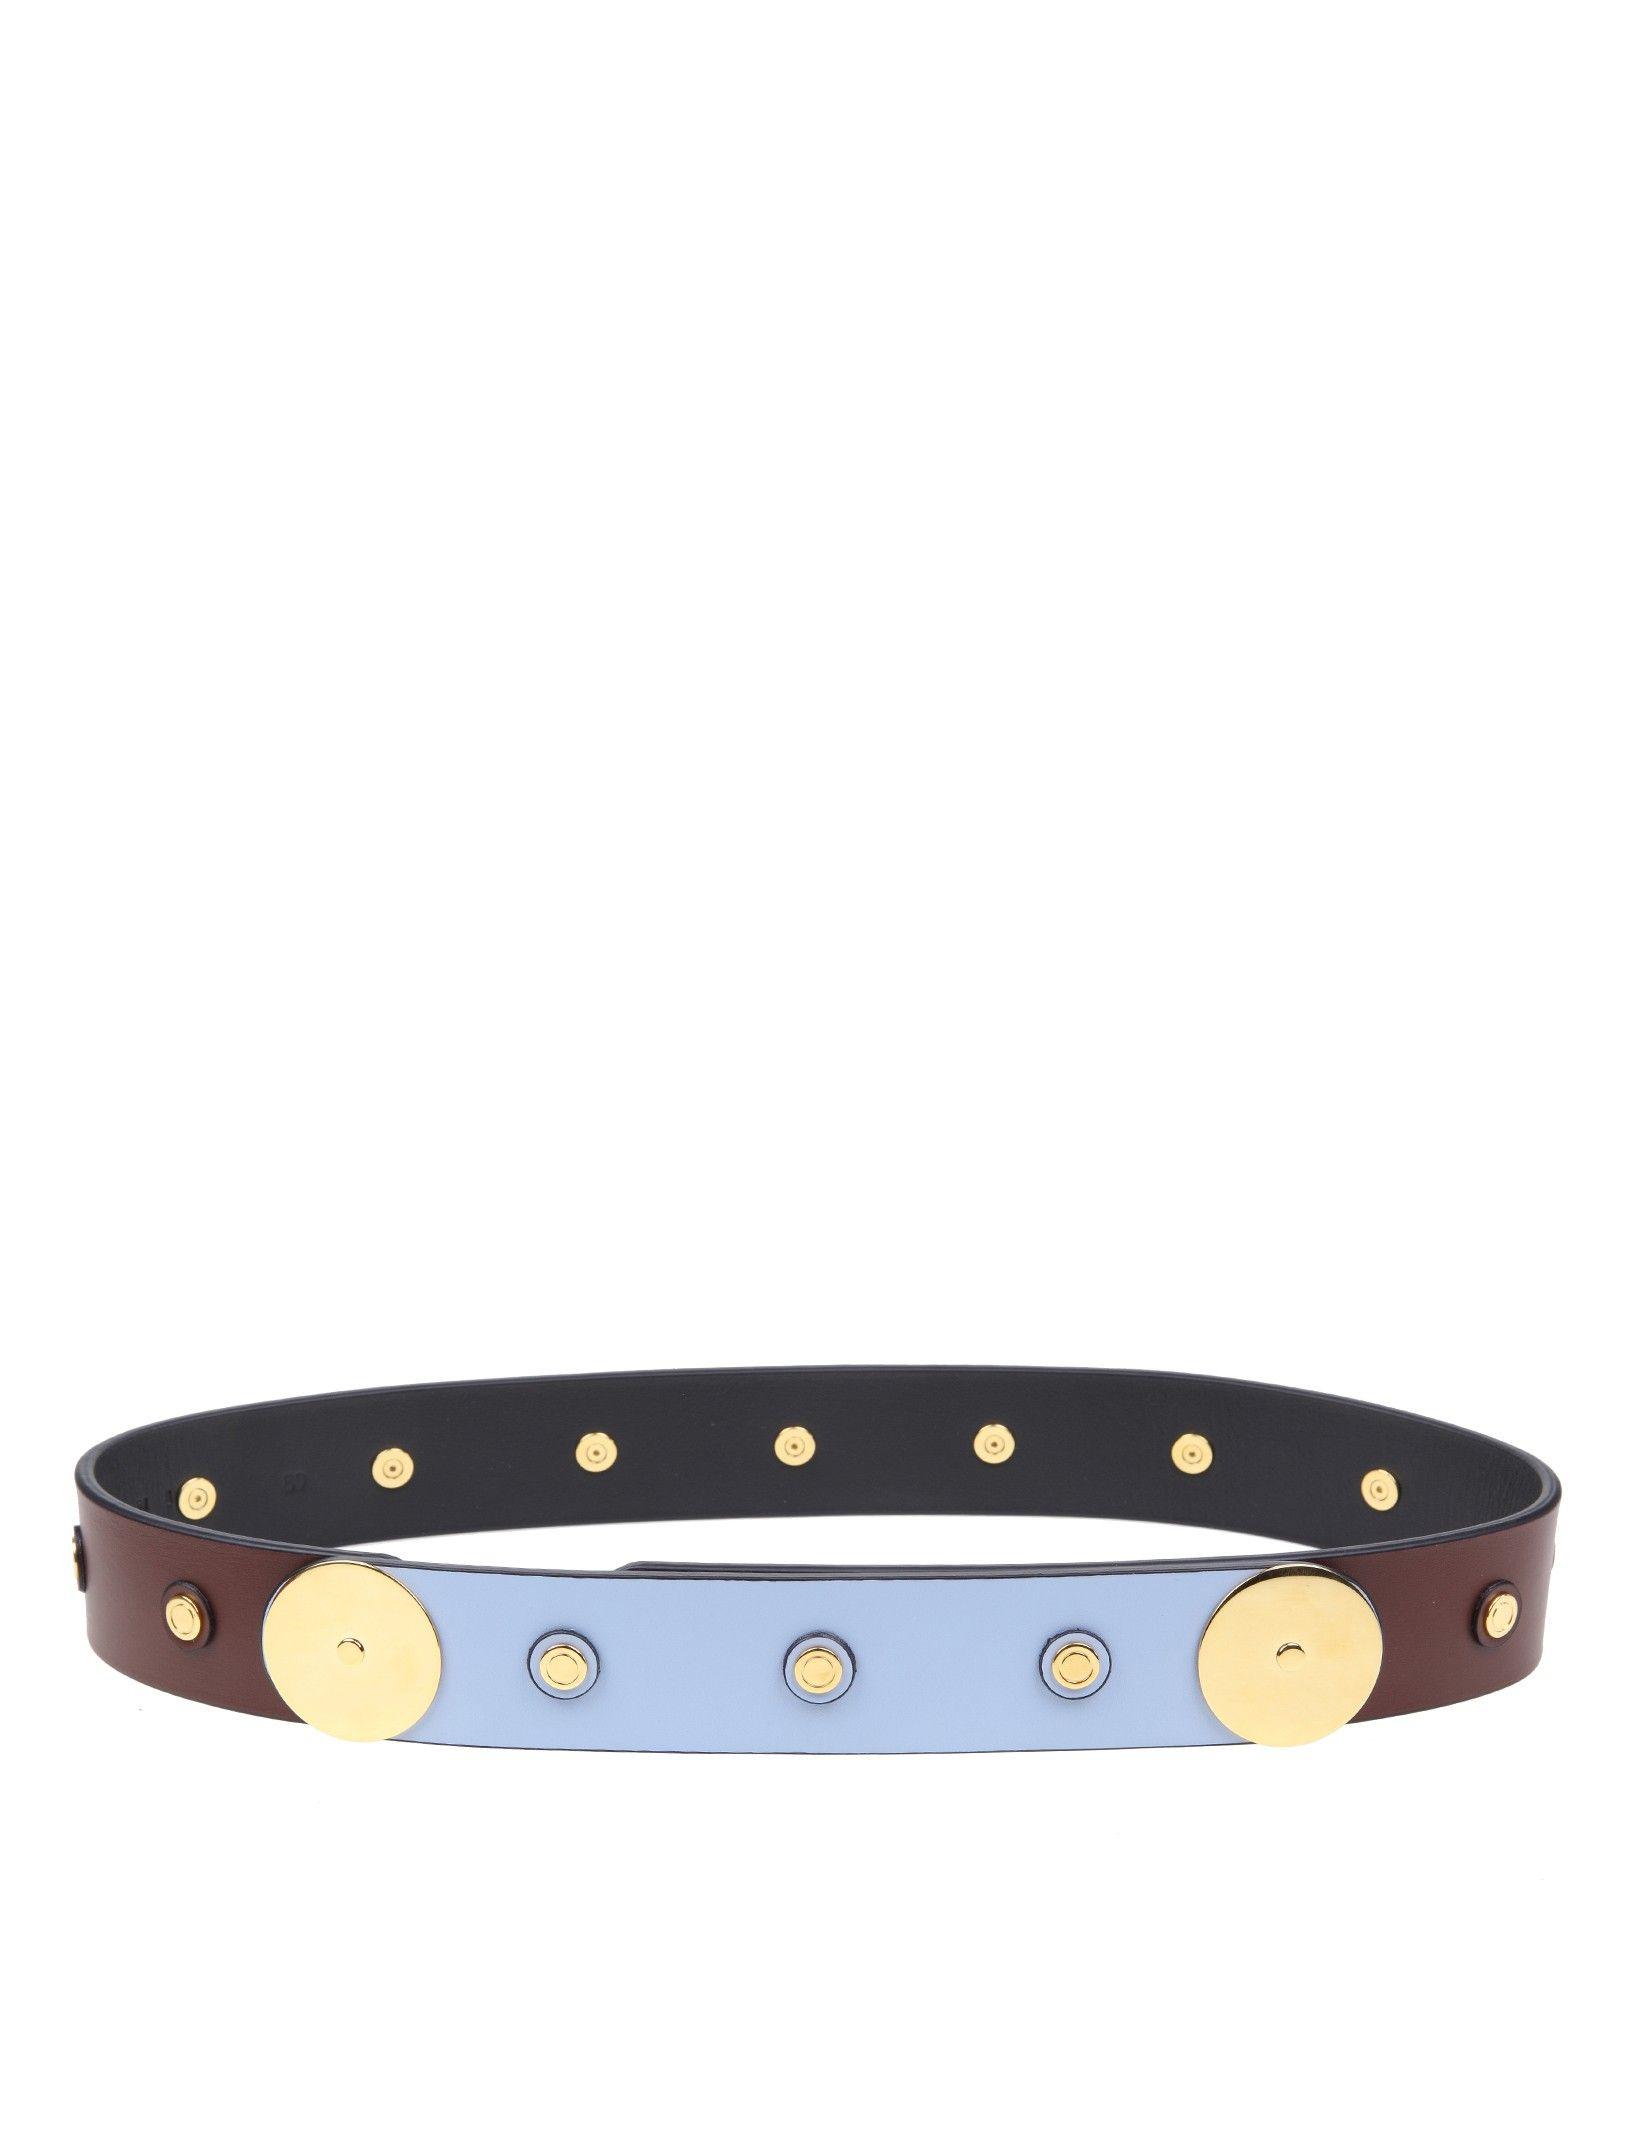 Marni Brown Leather Belt